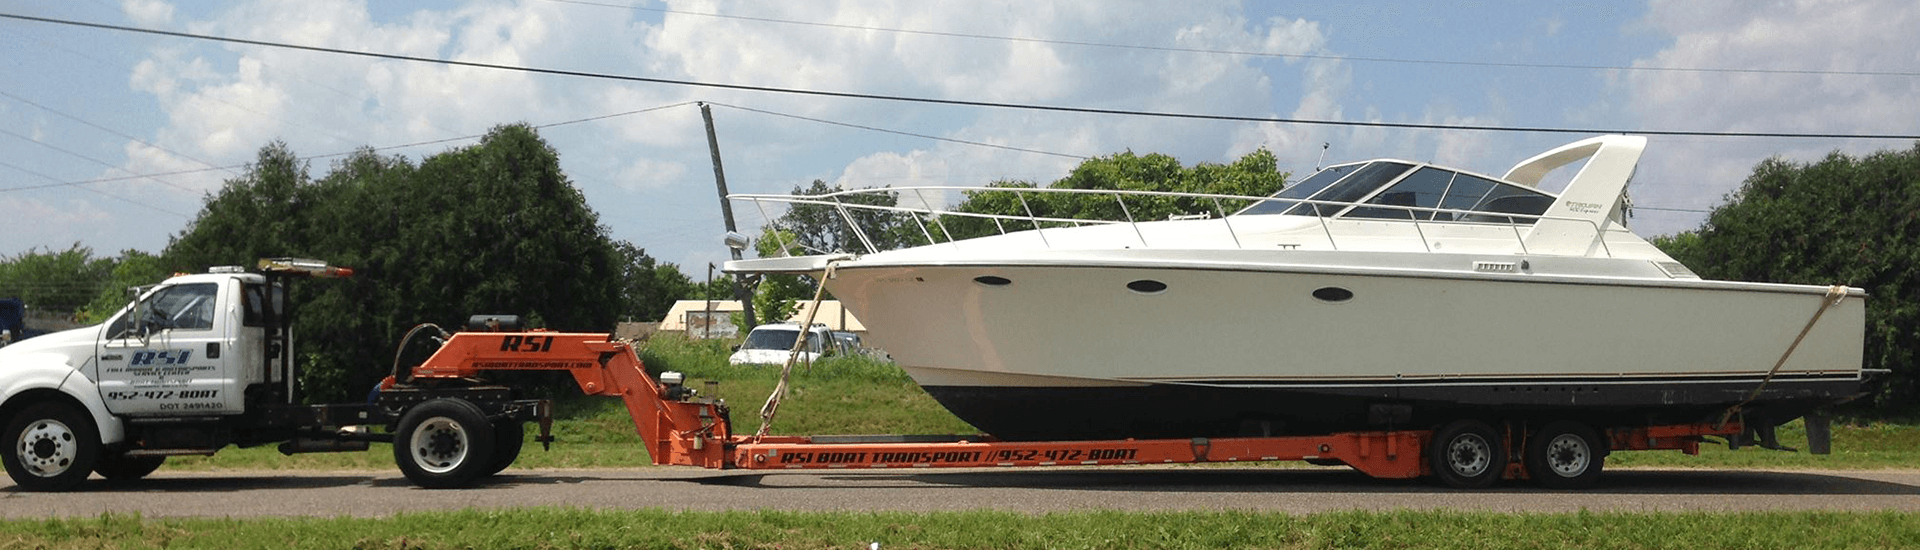 Large Boat Transportation Service by RSI Marine Lake Minnetonka